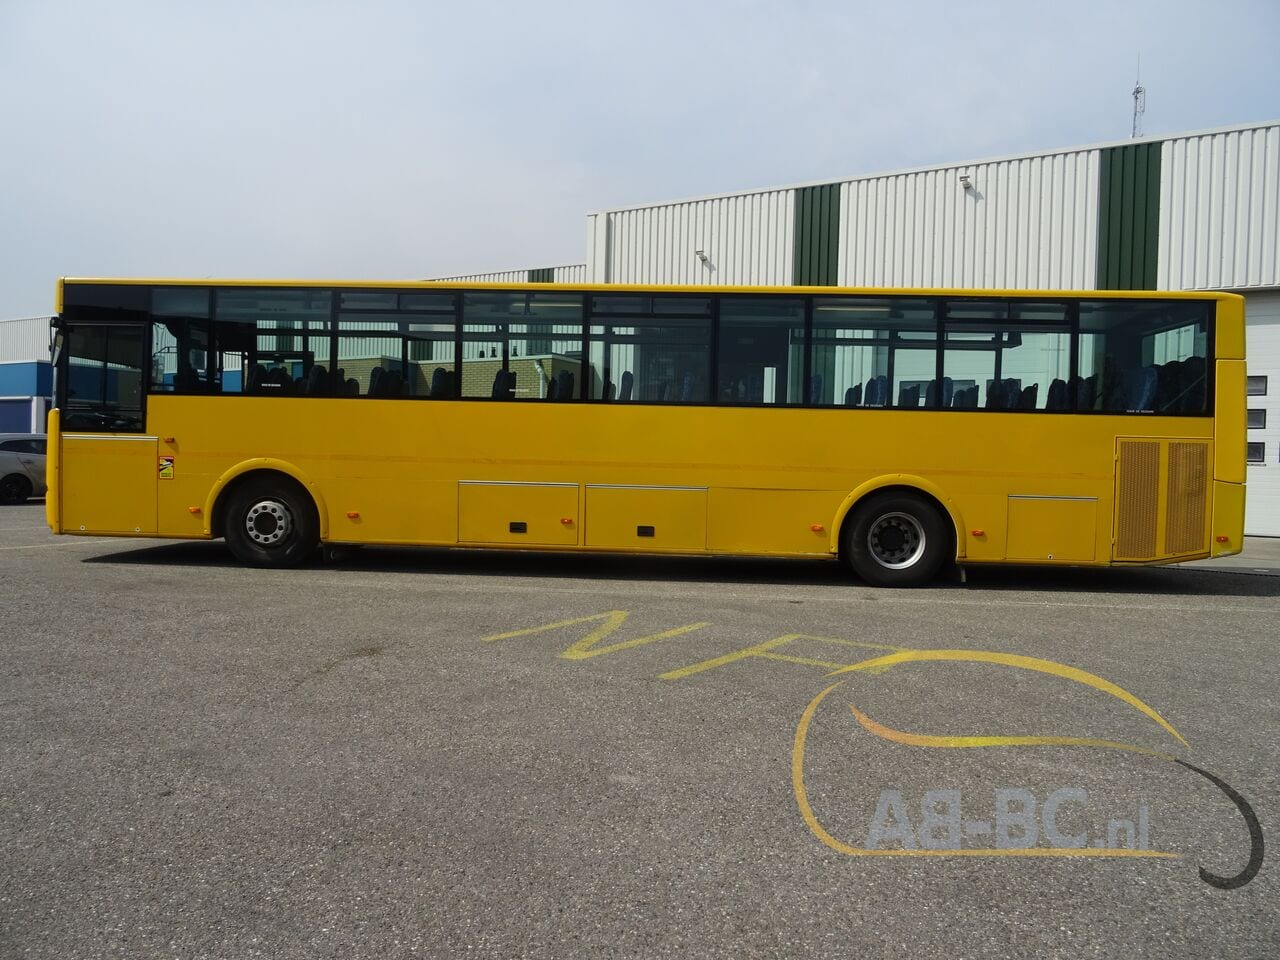 interurban-busMAN-Fast-64-seats---1619619703889924304_big_08fb6aeb103877f06128841c3a23d5ff--21042817163019598600